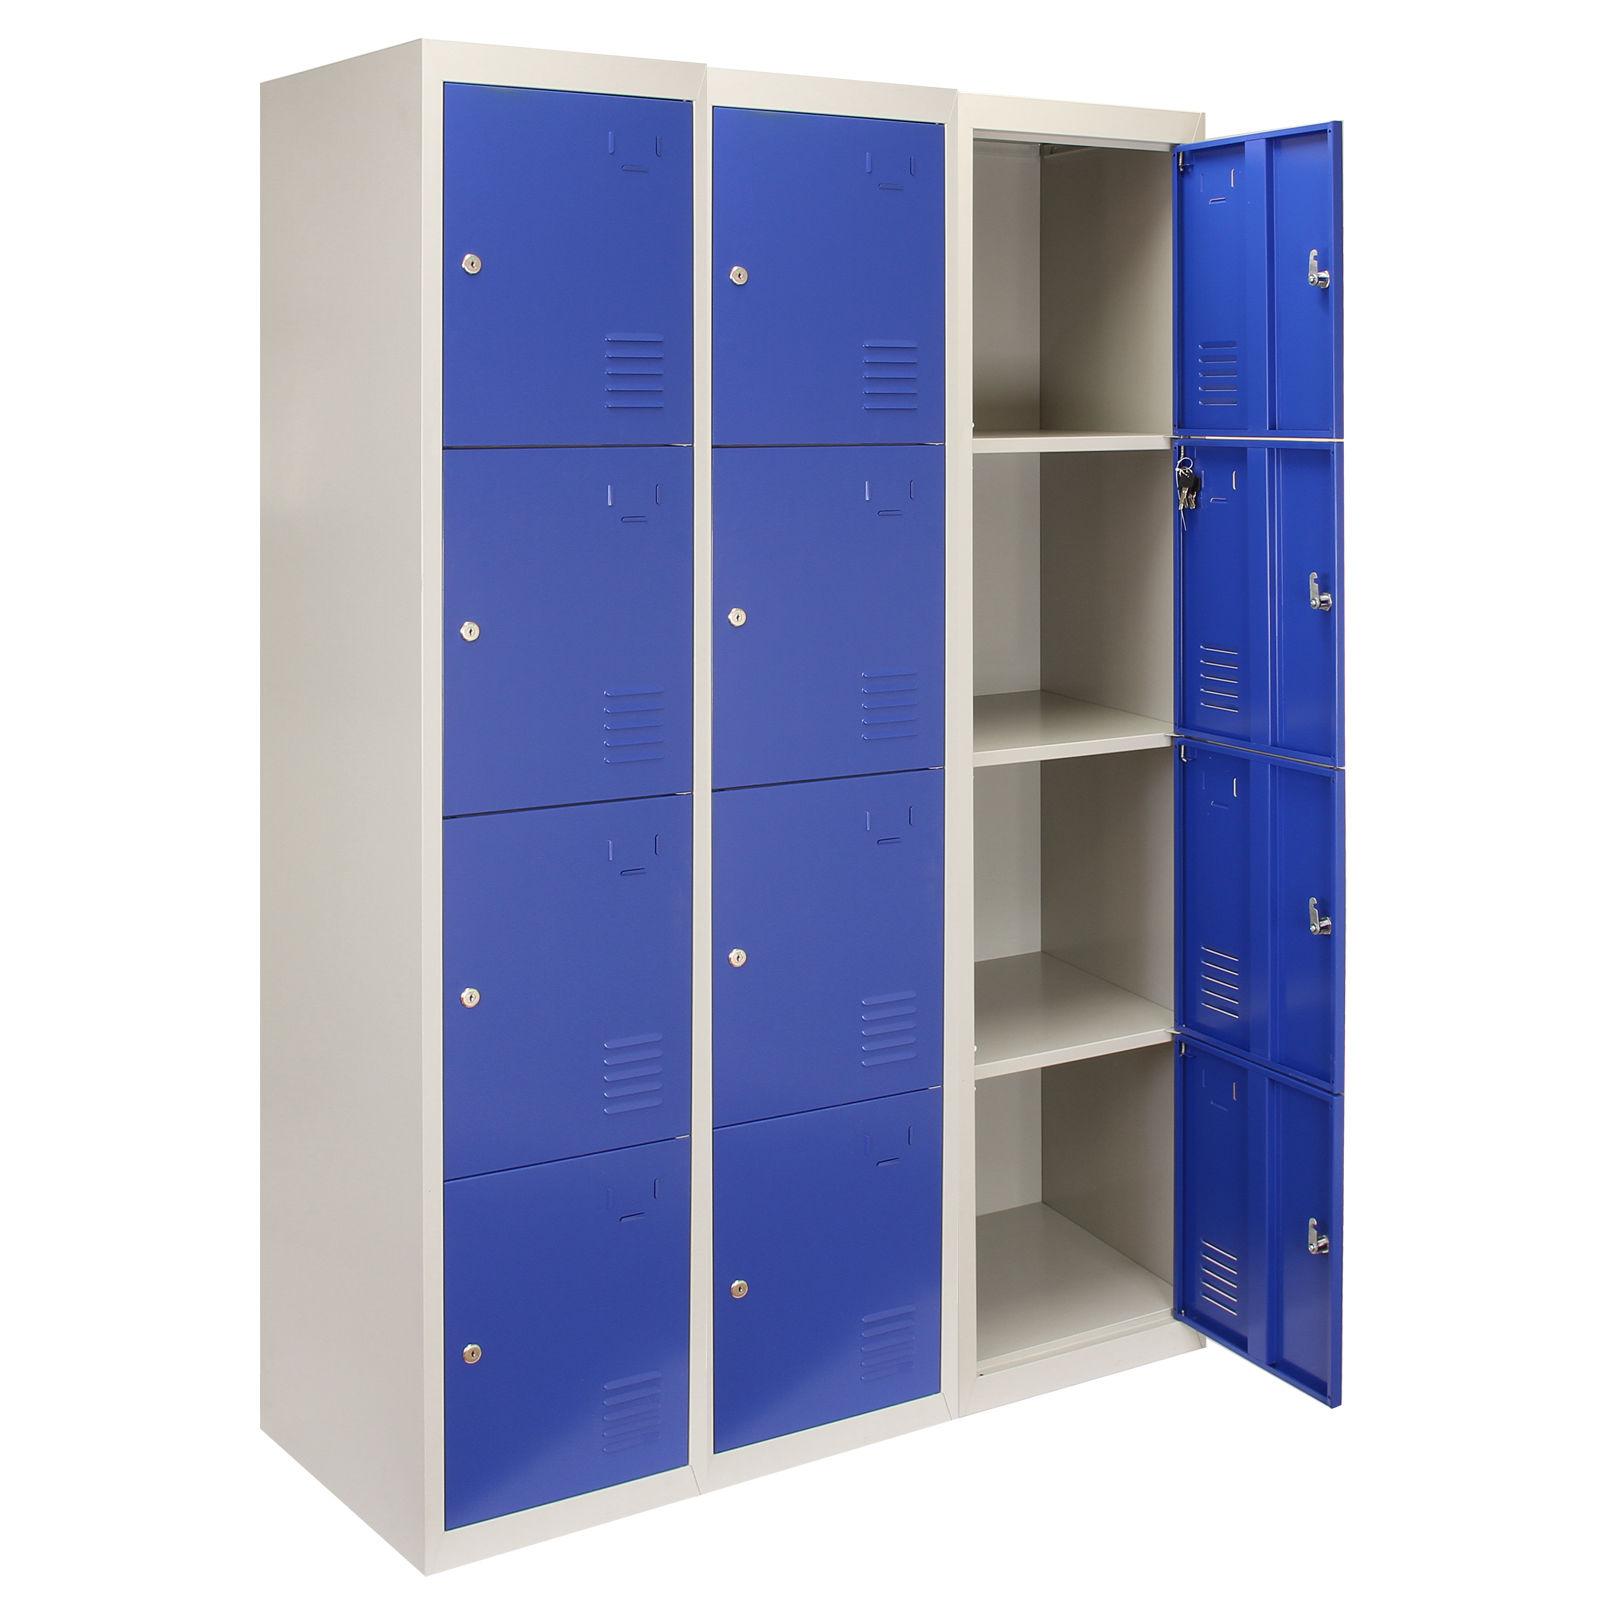 3x Metal Lockers 4 Door Steel Staff Locker Gym Changing Room Lockable Storage